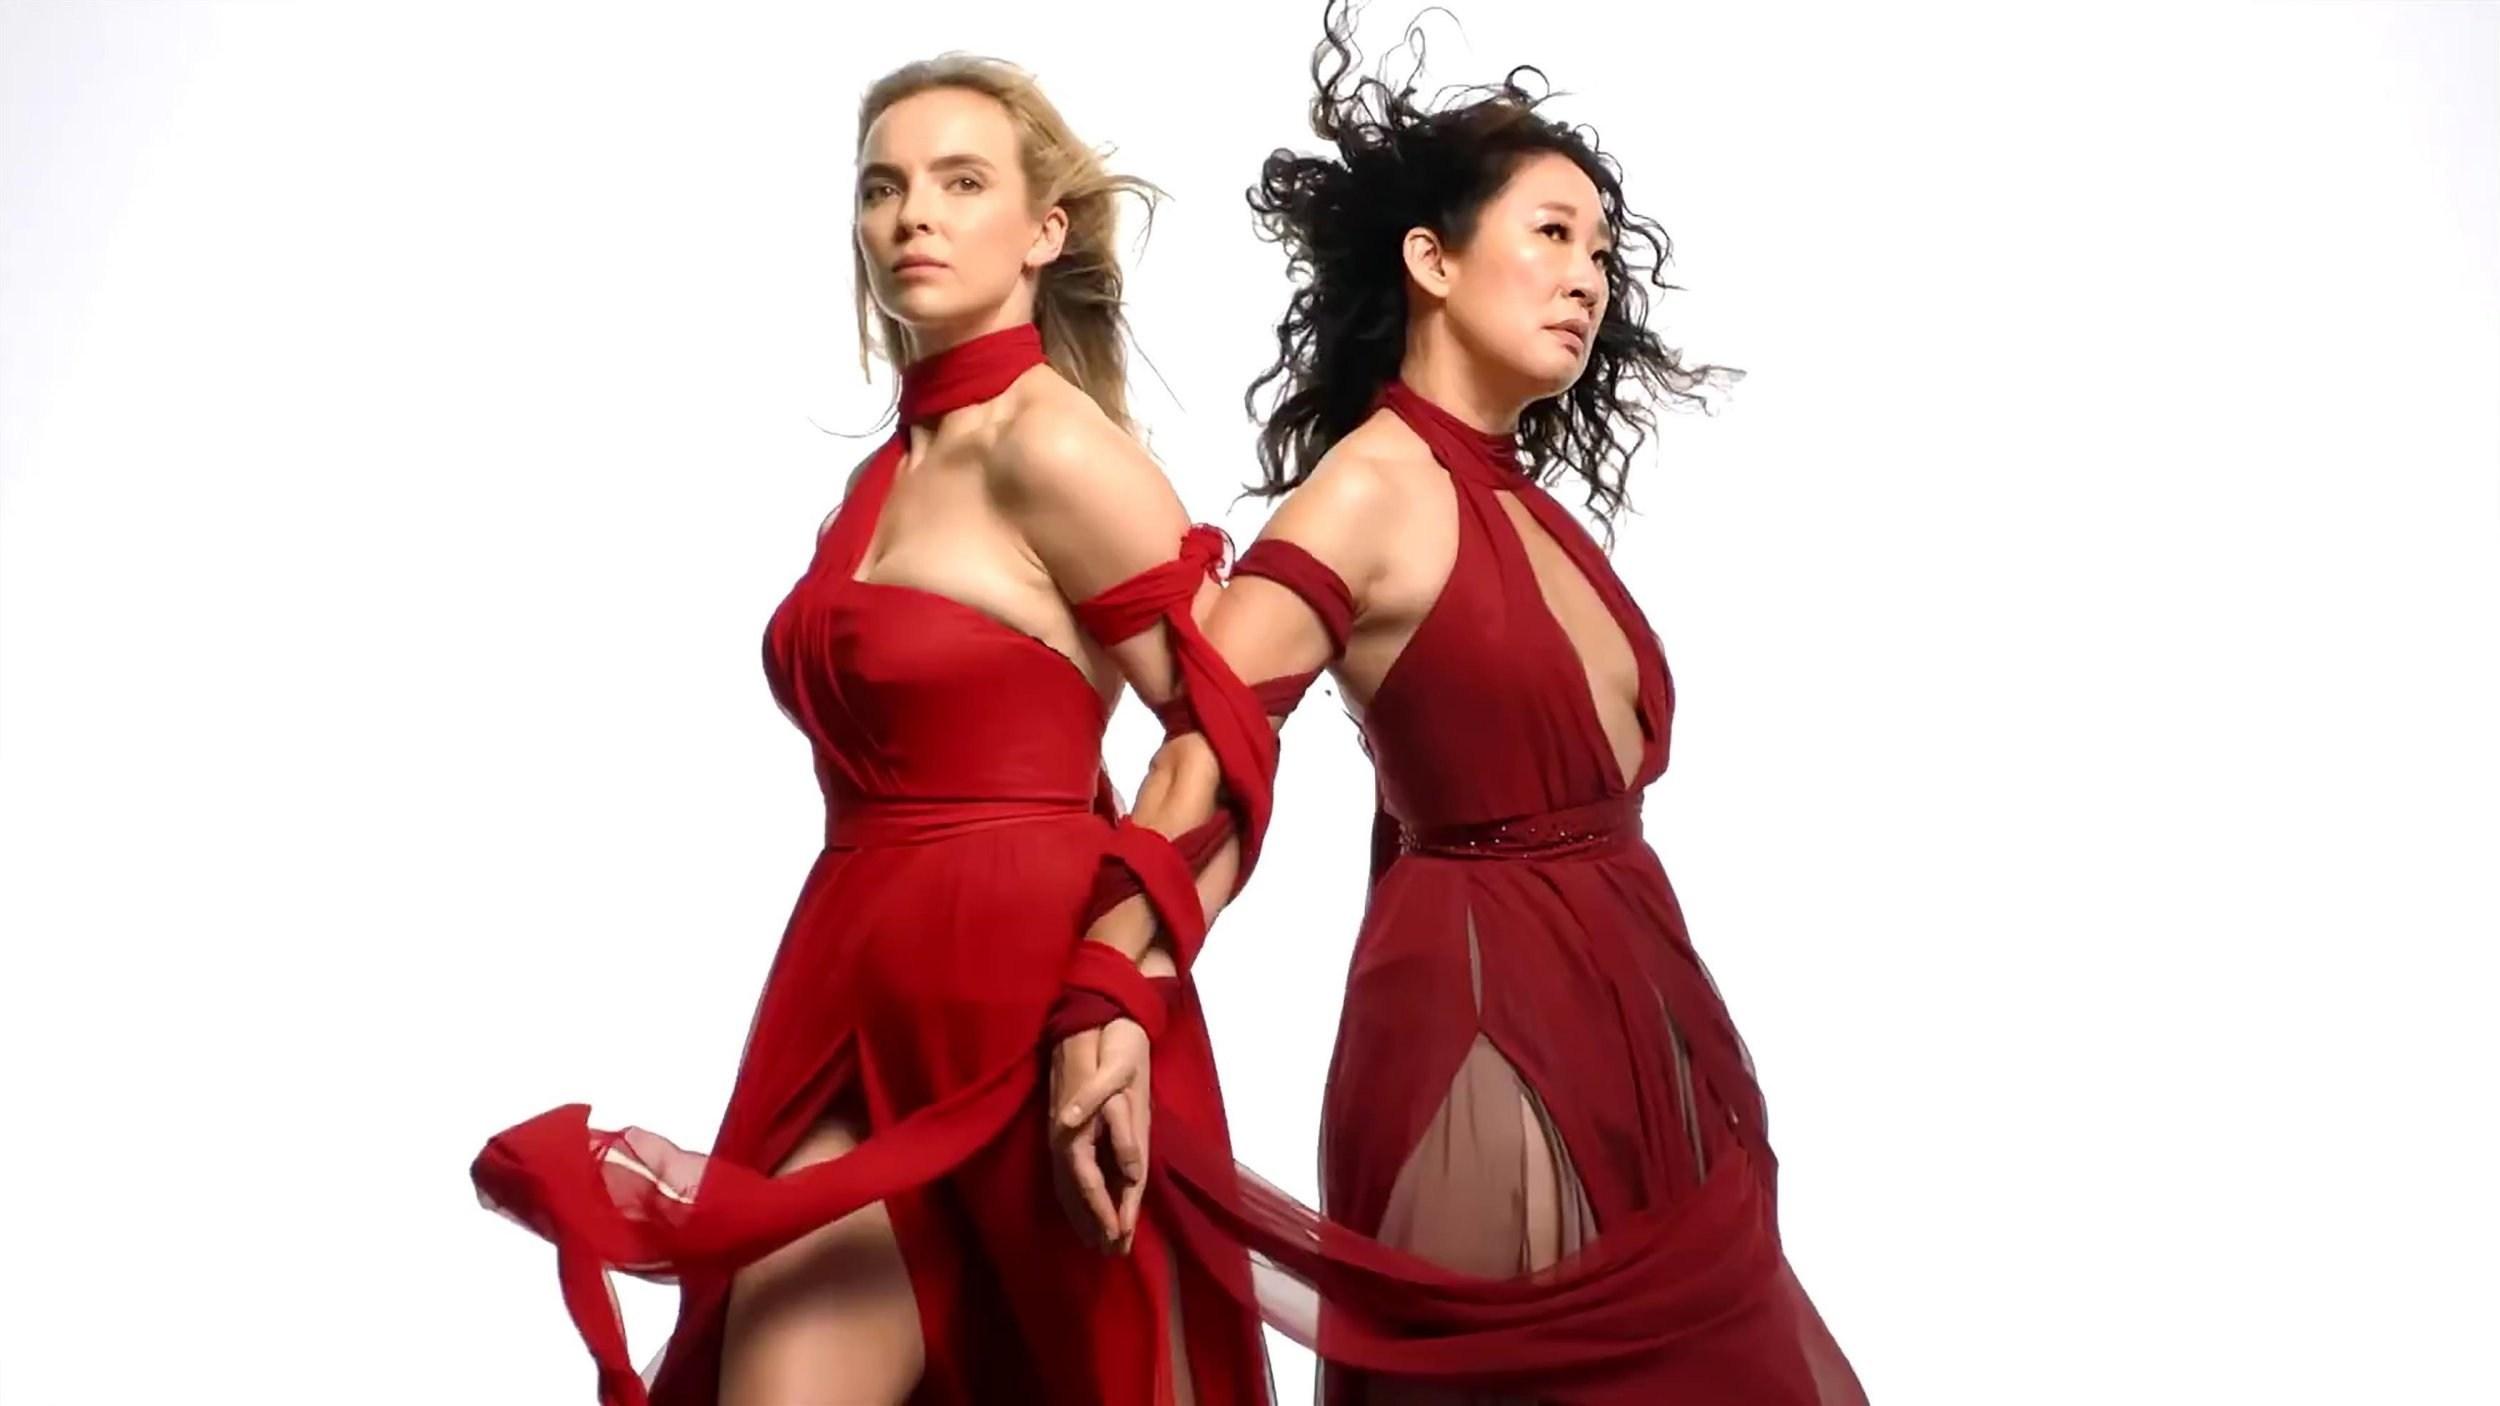 Killing Eve season 3 trailer surprises fans by bringing forward release date amid coronavirus crisis